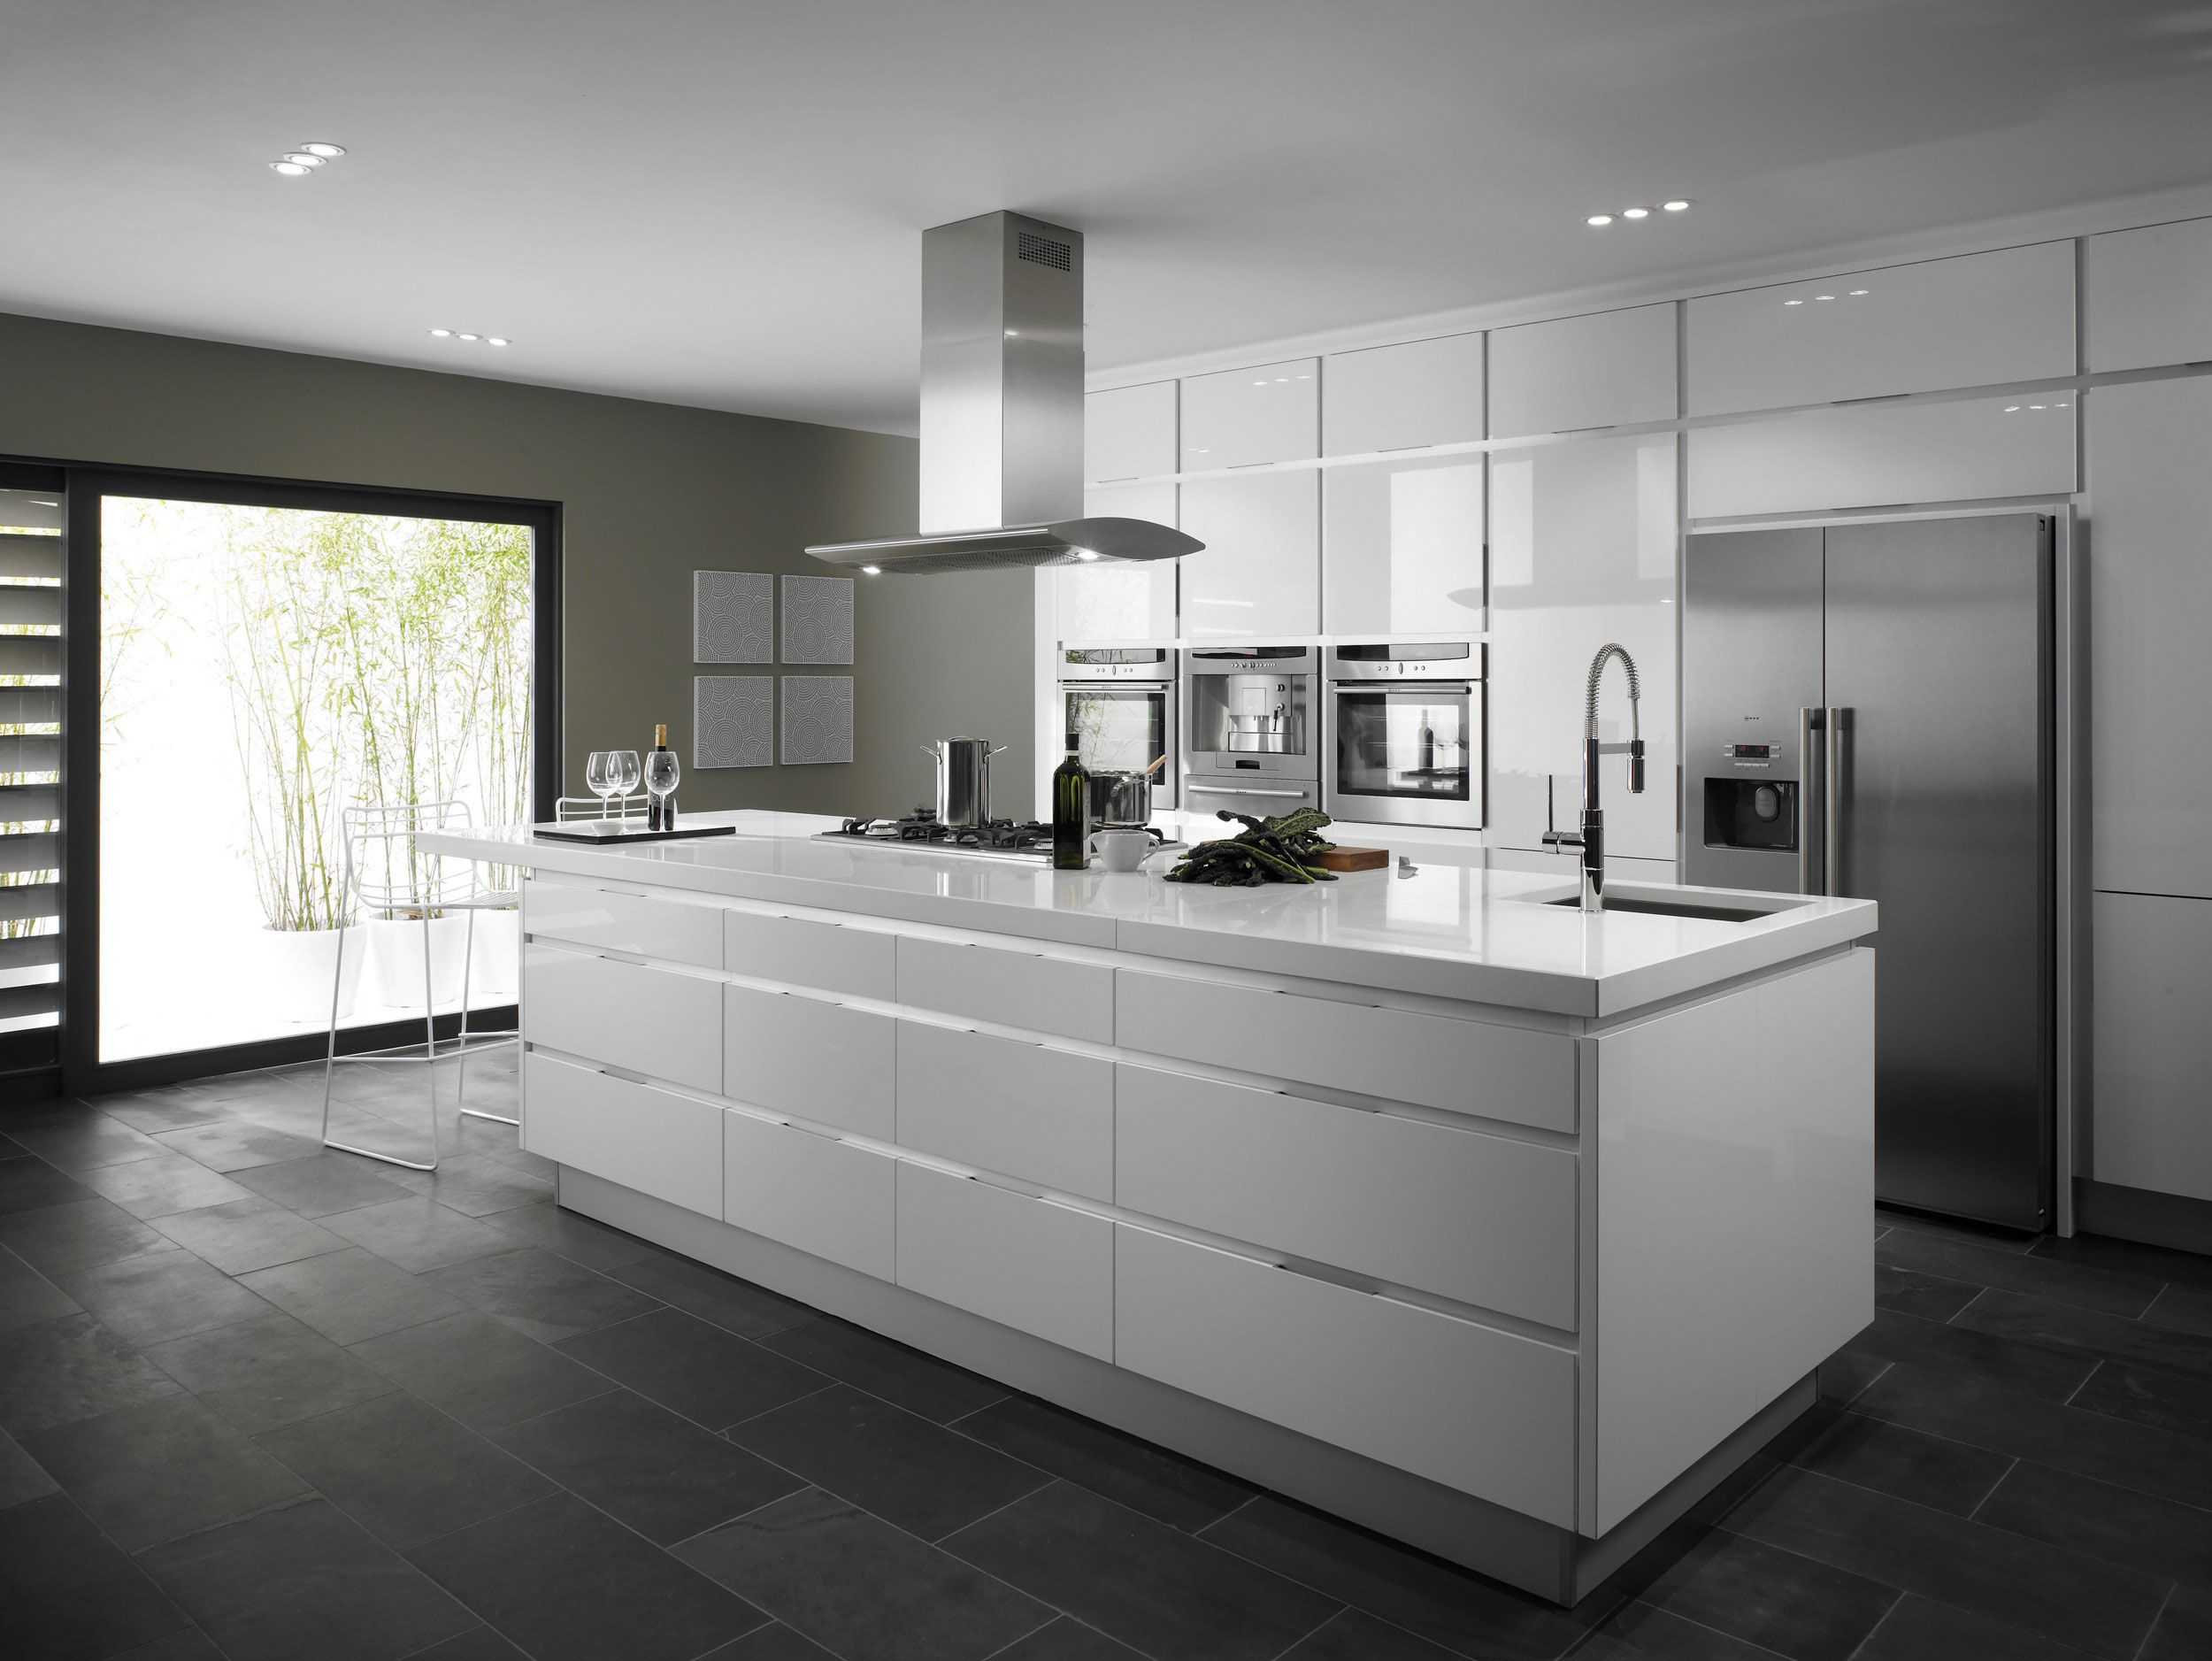 Kitchens White Large Interior Idea | kitchen ideas | Pinterest ...